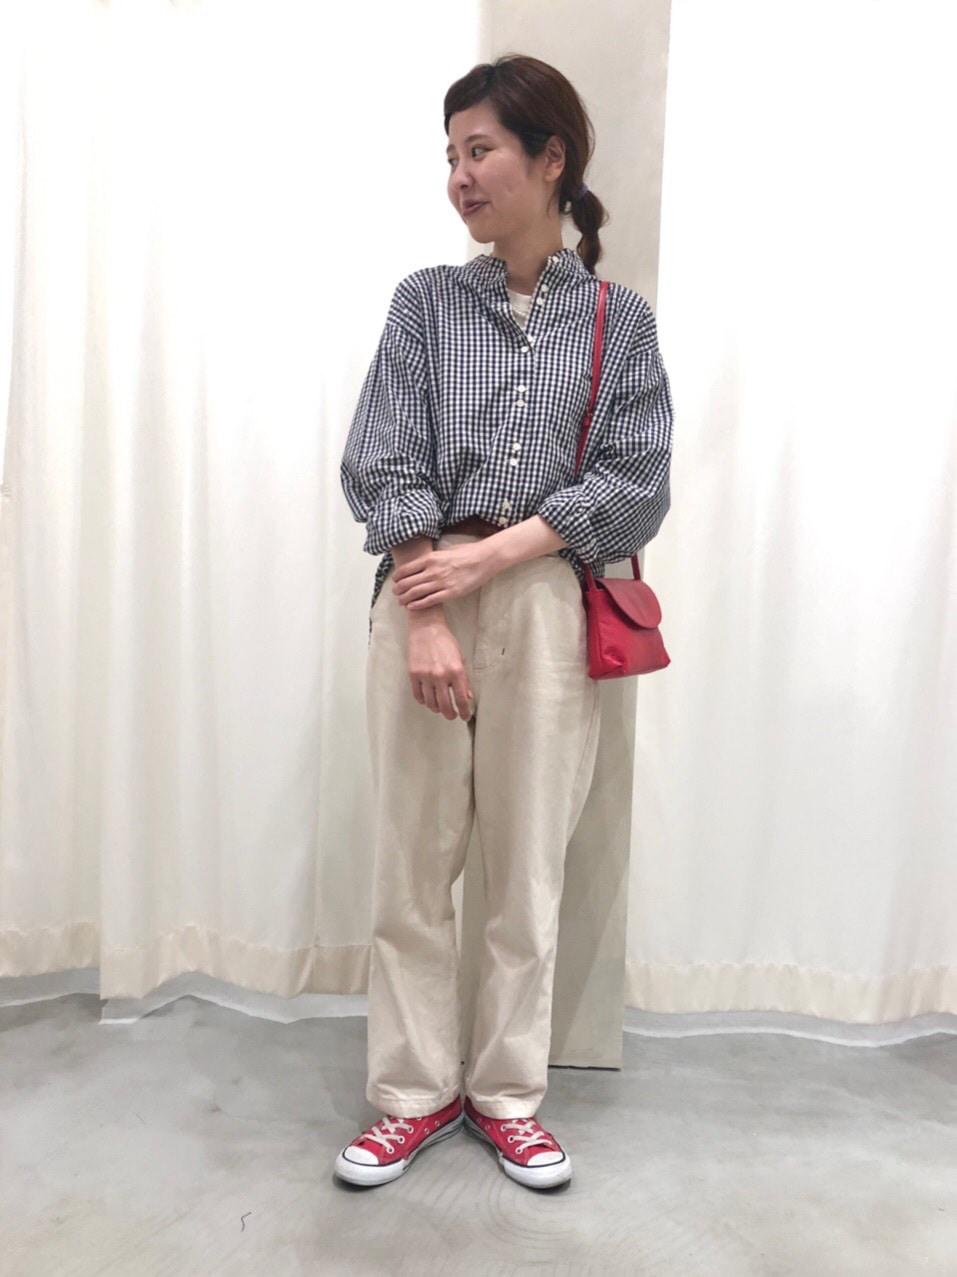 CHILD WOMAN , PAR ICI 東京スカイツリータウン・ソラマチ 2020.07.28